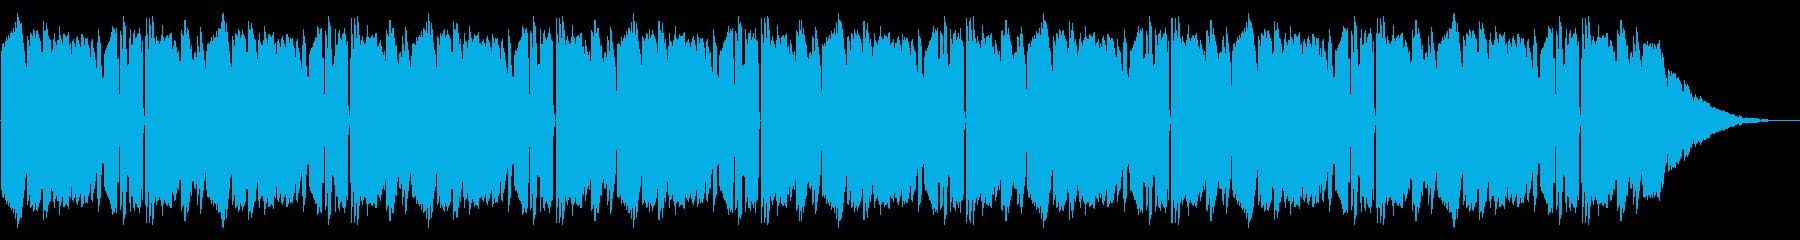 NES STG C06-2(エンディングの再生済みの波形